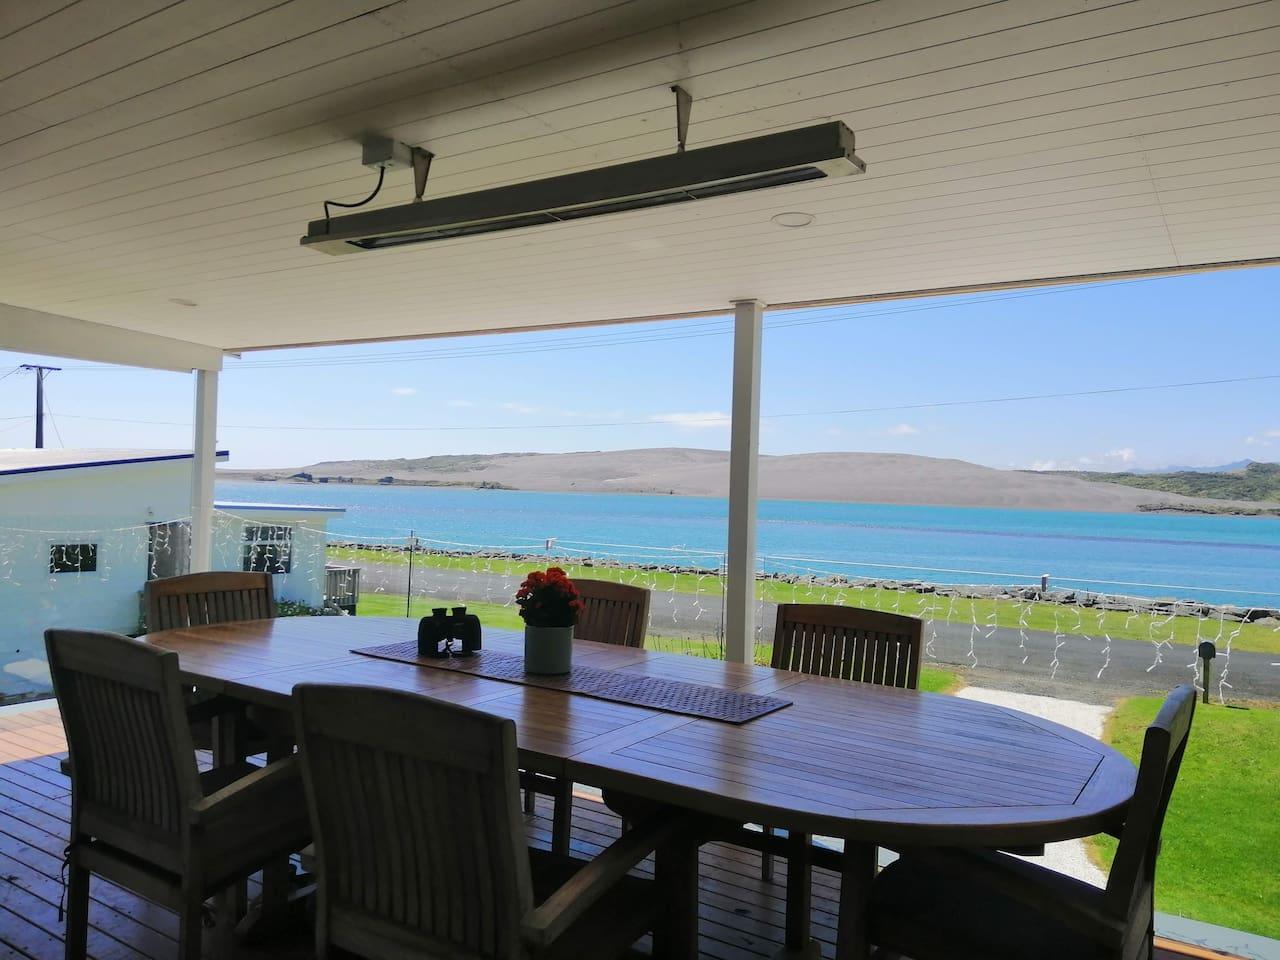 Dining & Entertaining Deck